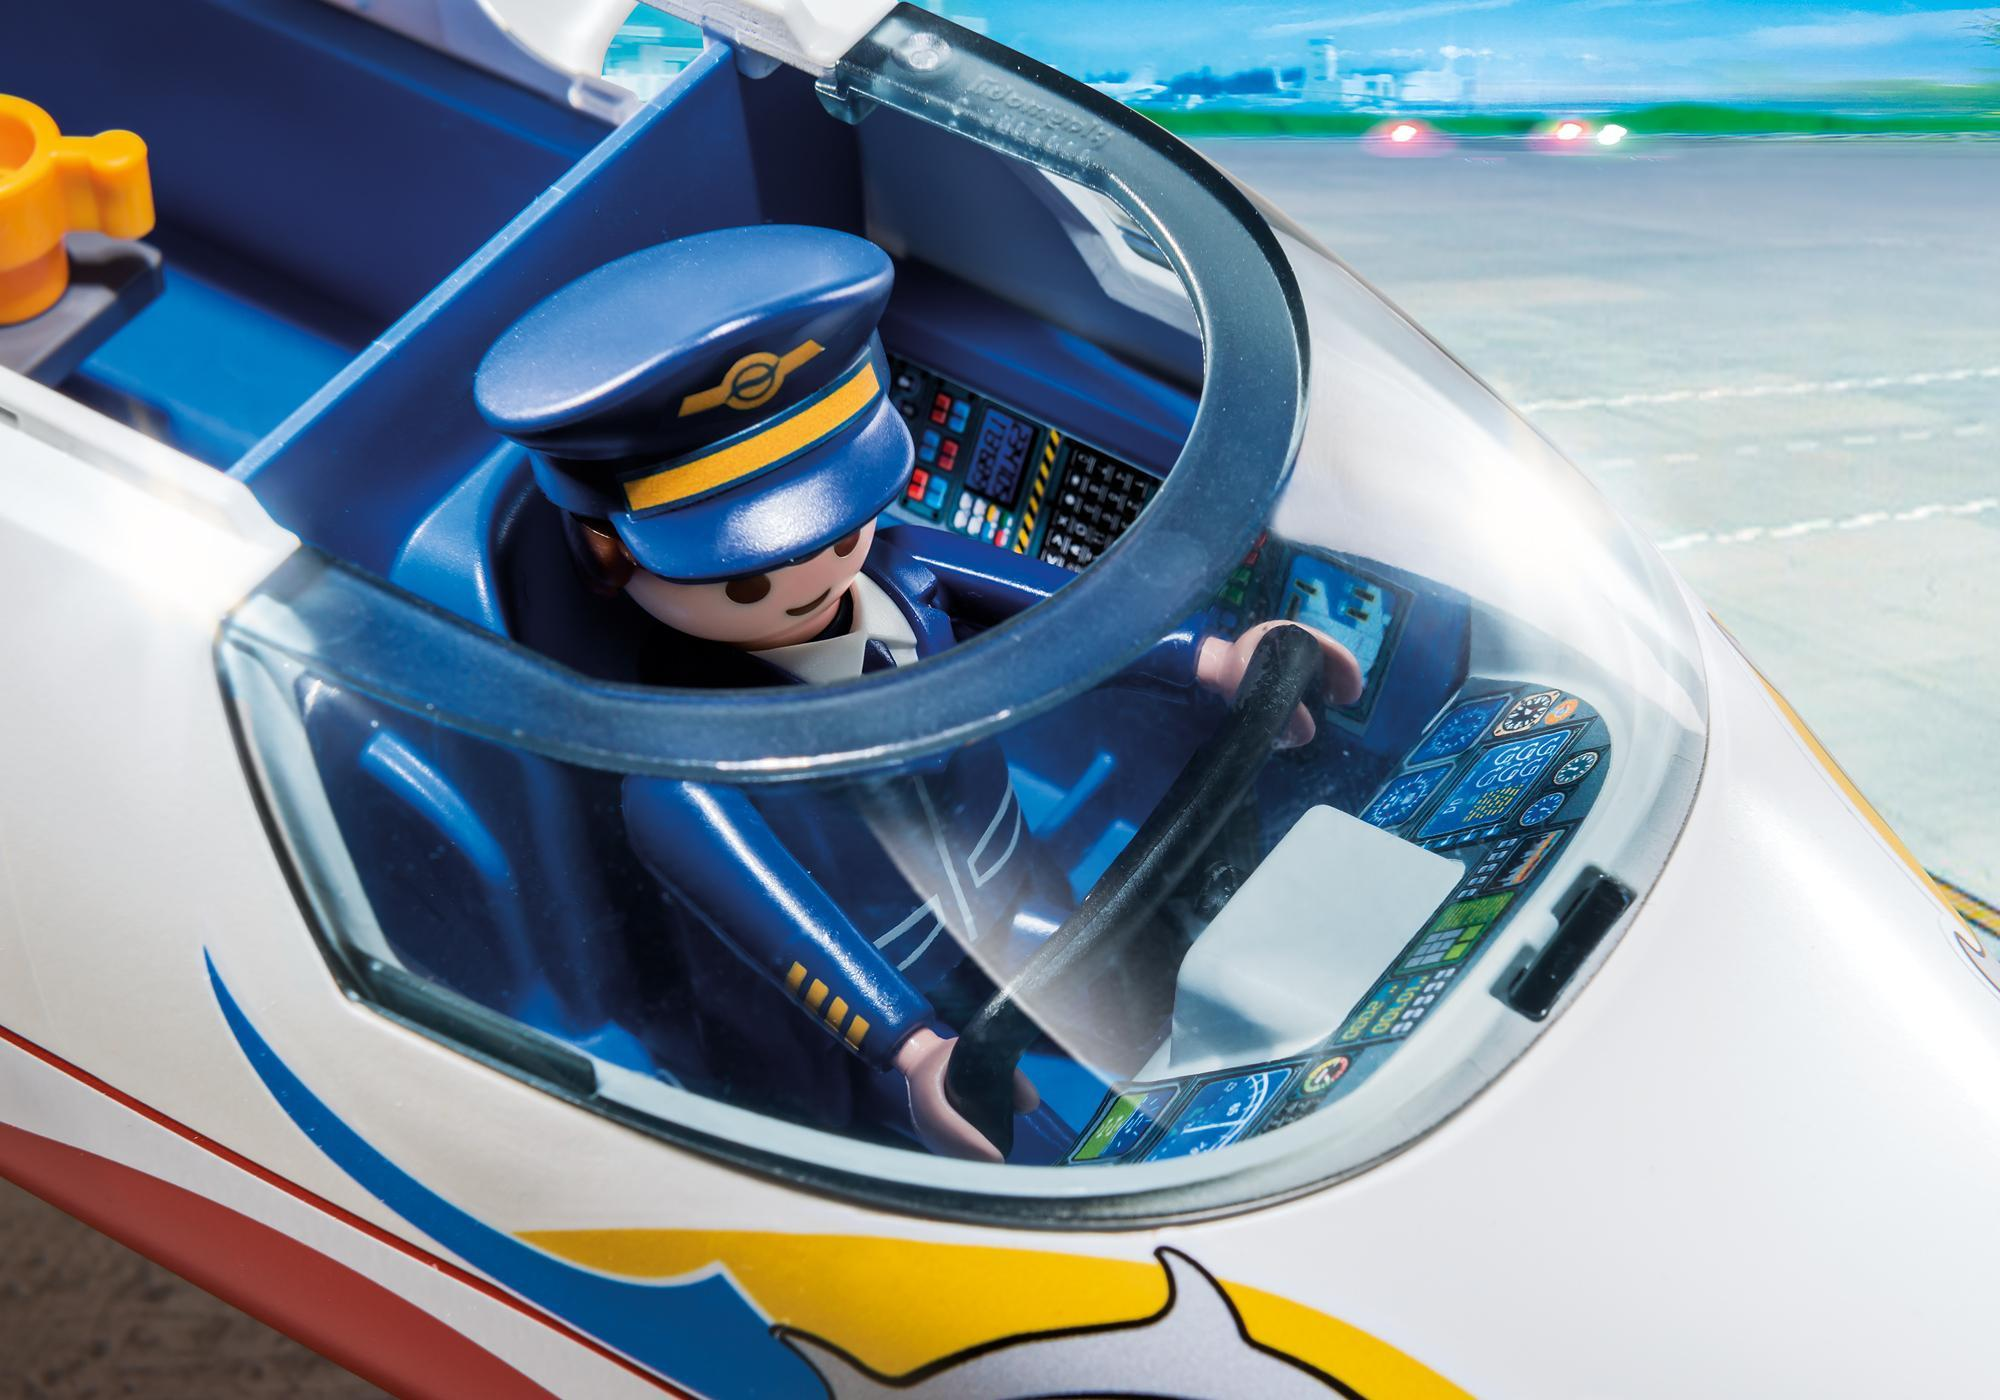 http://media.playmobil.com/i/playmobil/6081_product_extra2/Avion avec pilote et touristes